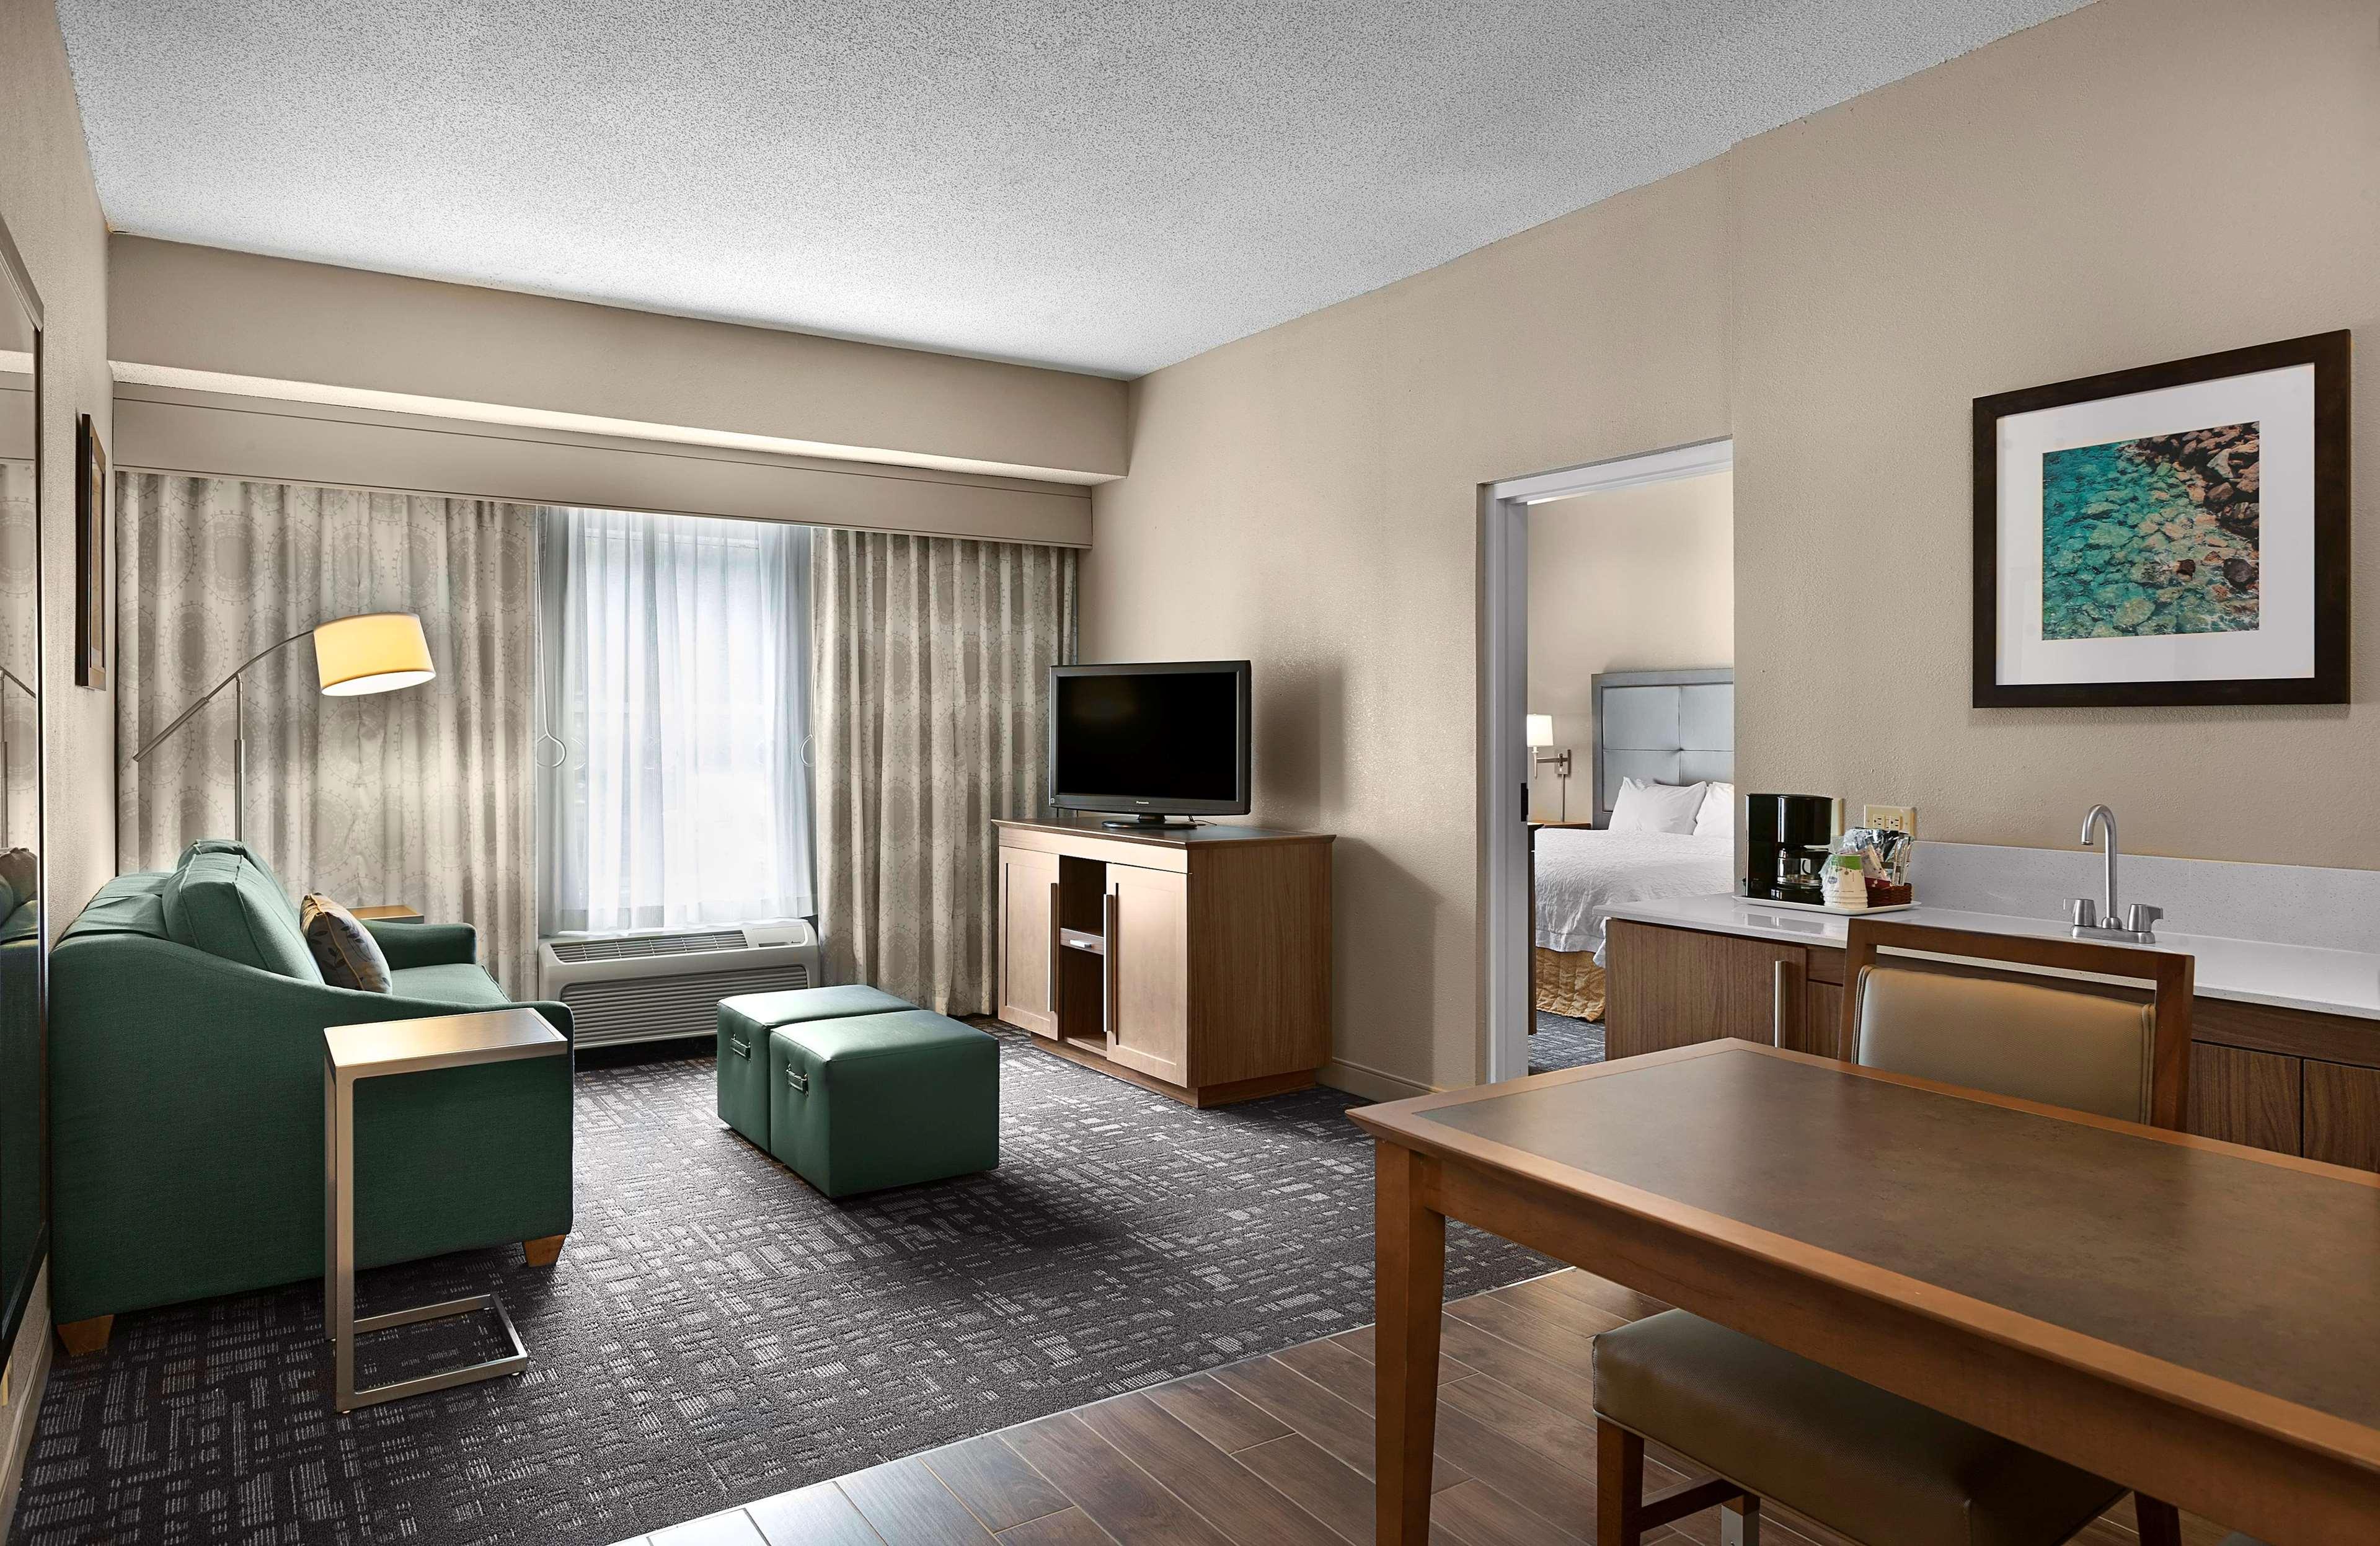 Hampton Inn & Suites Charlotte/Pineville image 30